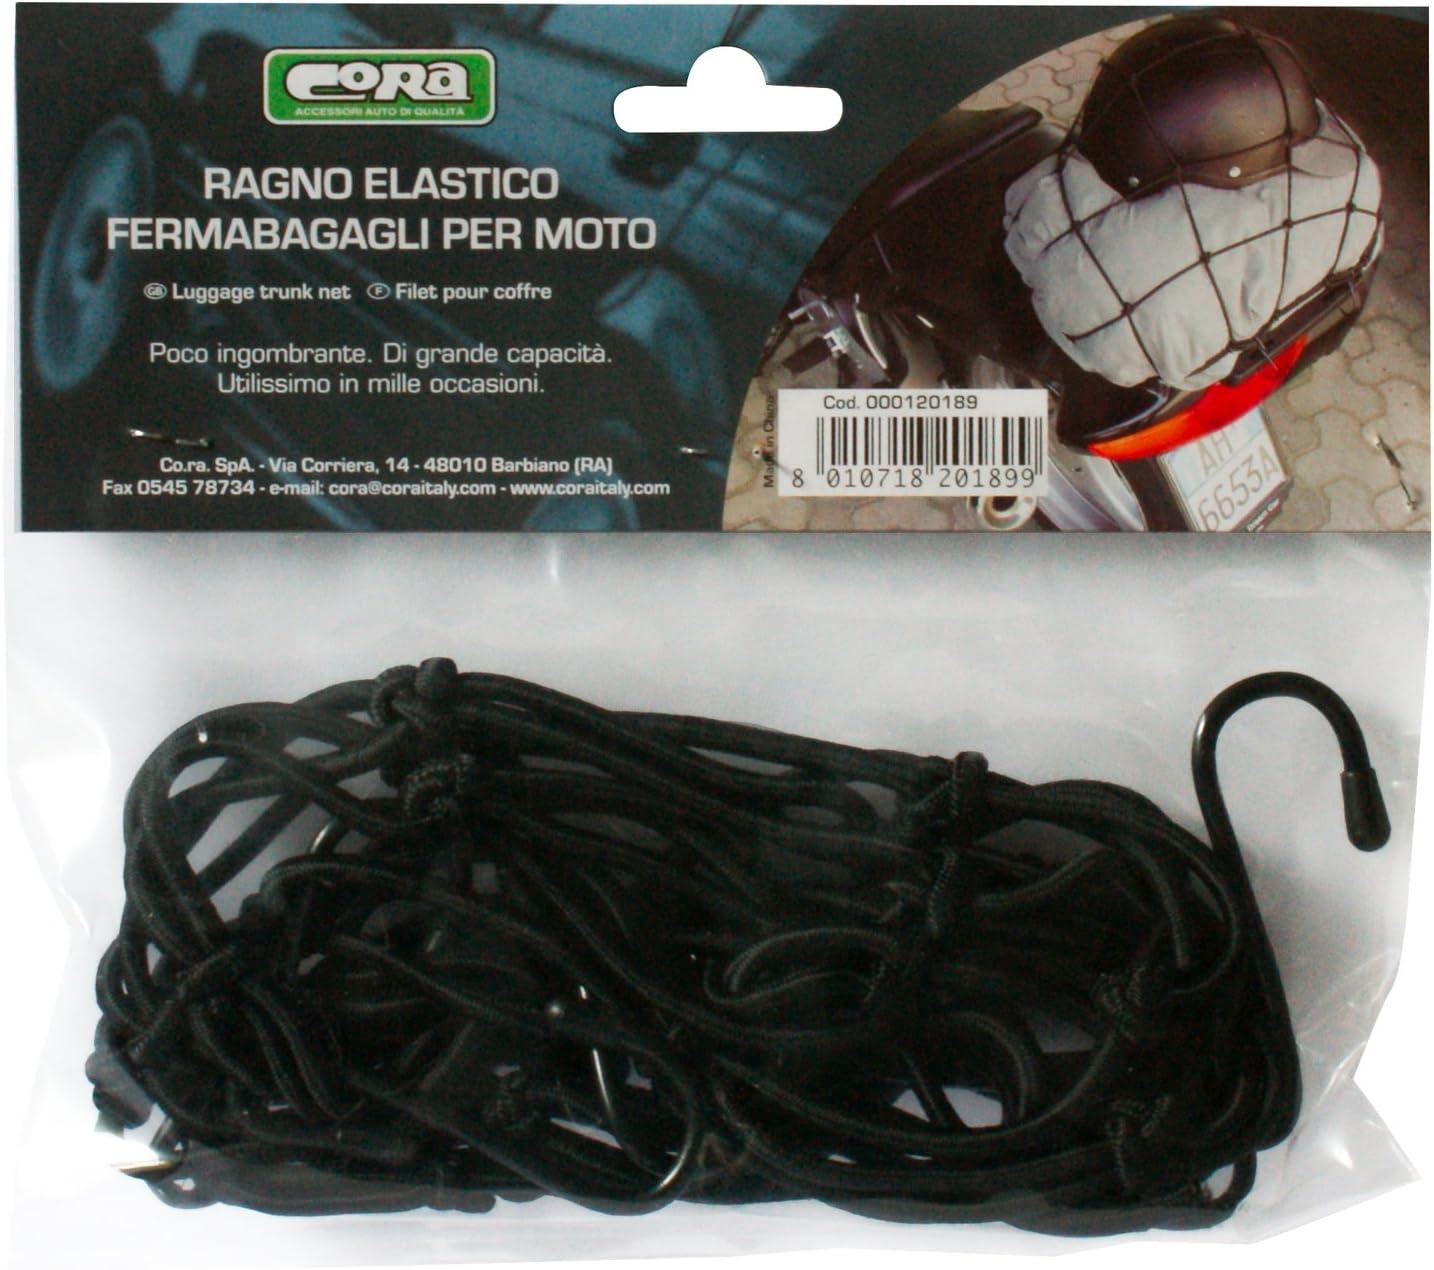 Black Cora 000120189 Motorbike Cargo Net